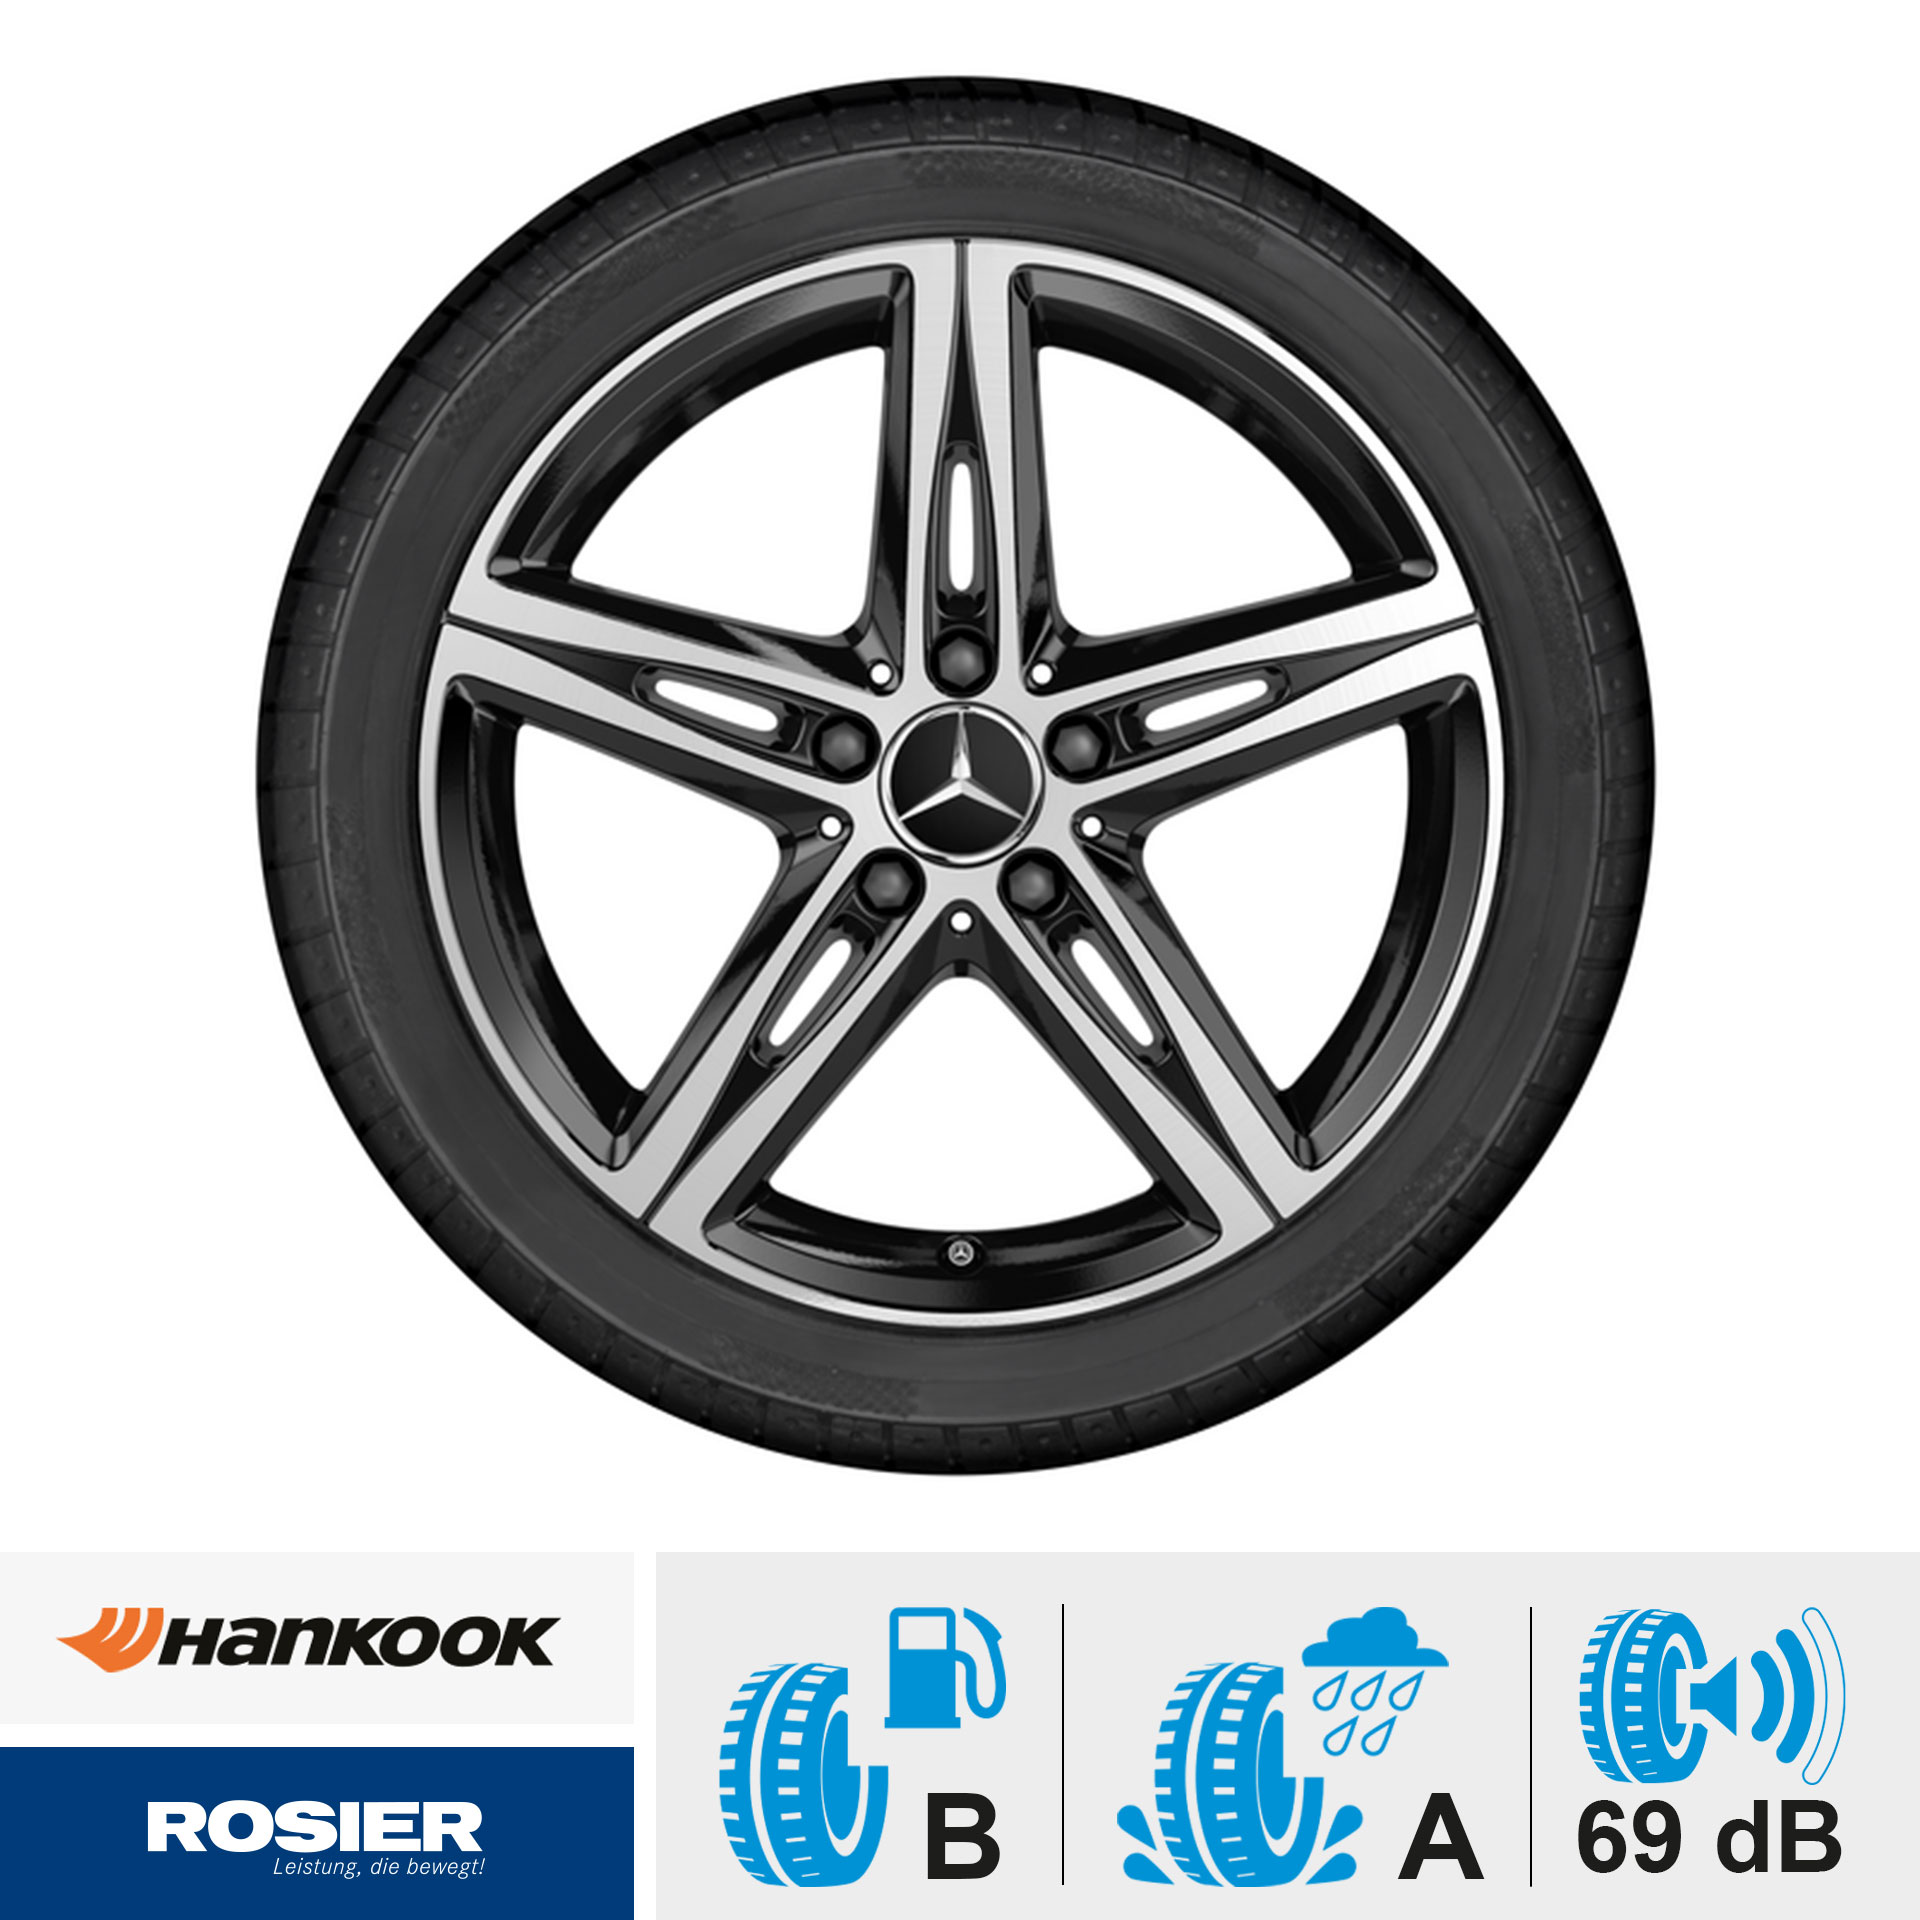 Sommerkomplettrad 5-Speichen-Rad schwarz glanzgedreht Hankook Ventus S1 evo2 MO 225/45 R18 91W / Mercedes-Benz A-Klasse / CLA & B-Klasse Felgen